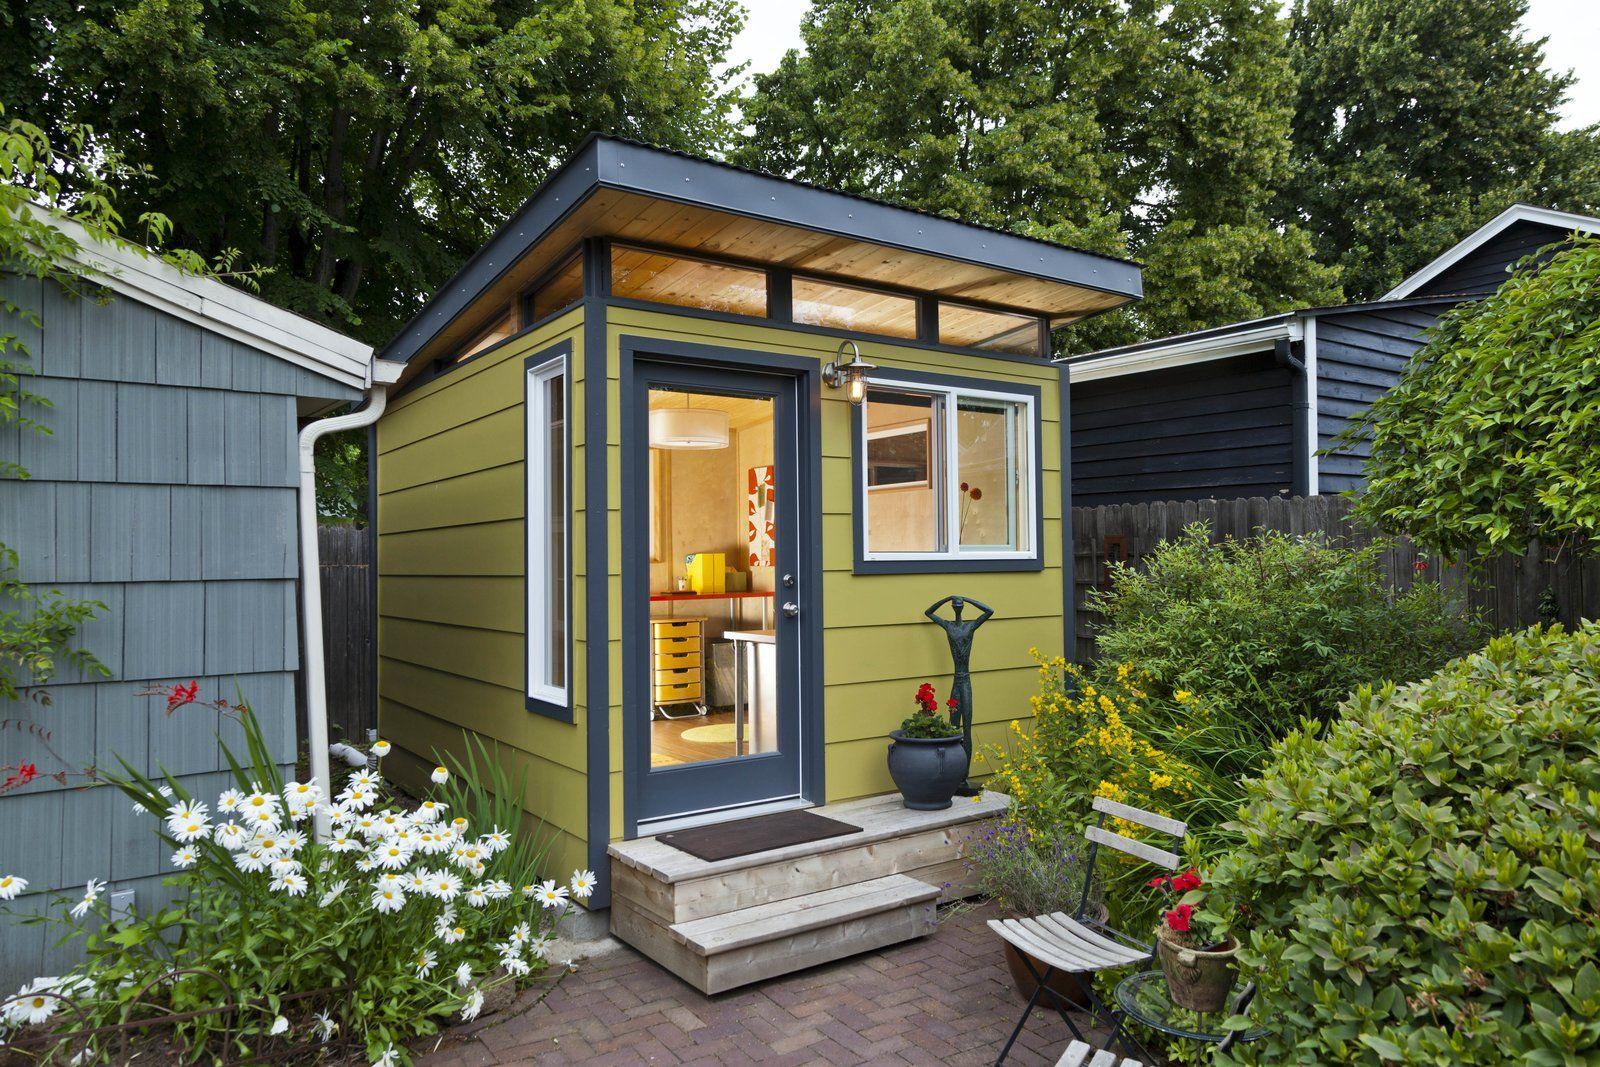 Modern She Shed Designs And Ideas Shed Design Backyard Storage Sheds She Shed Decorating Ideas